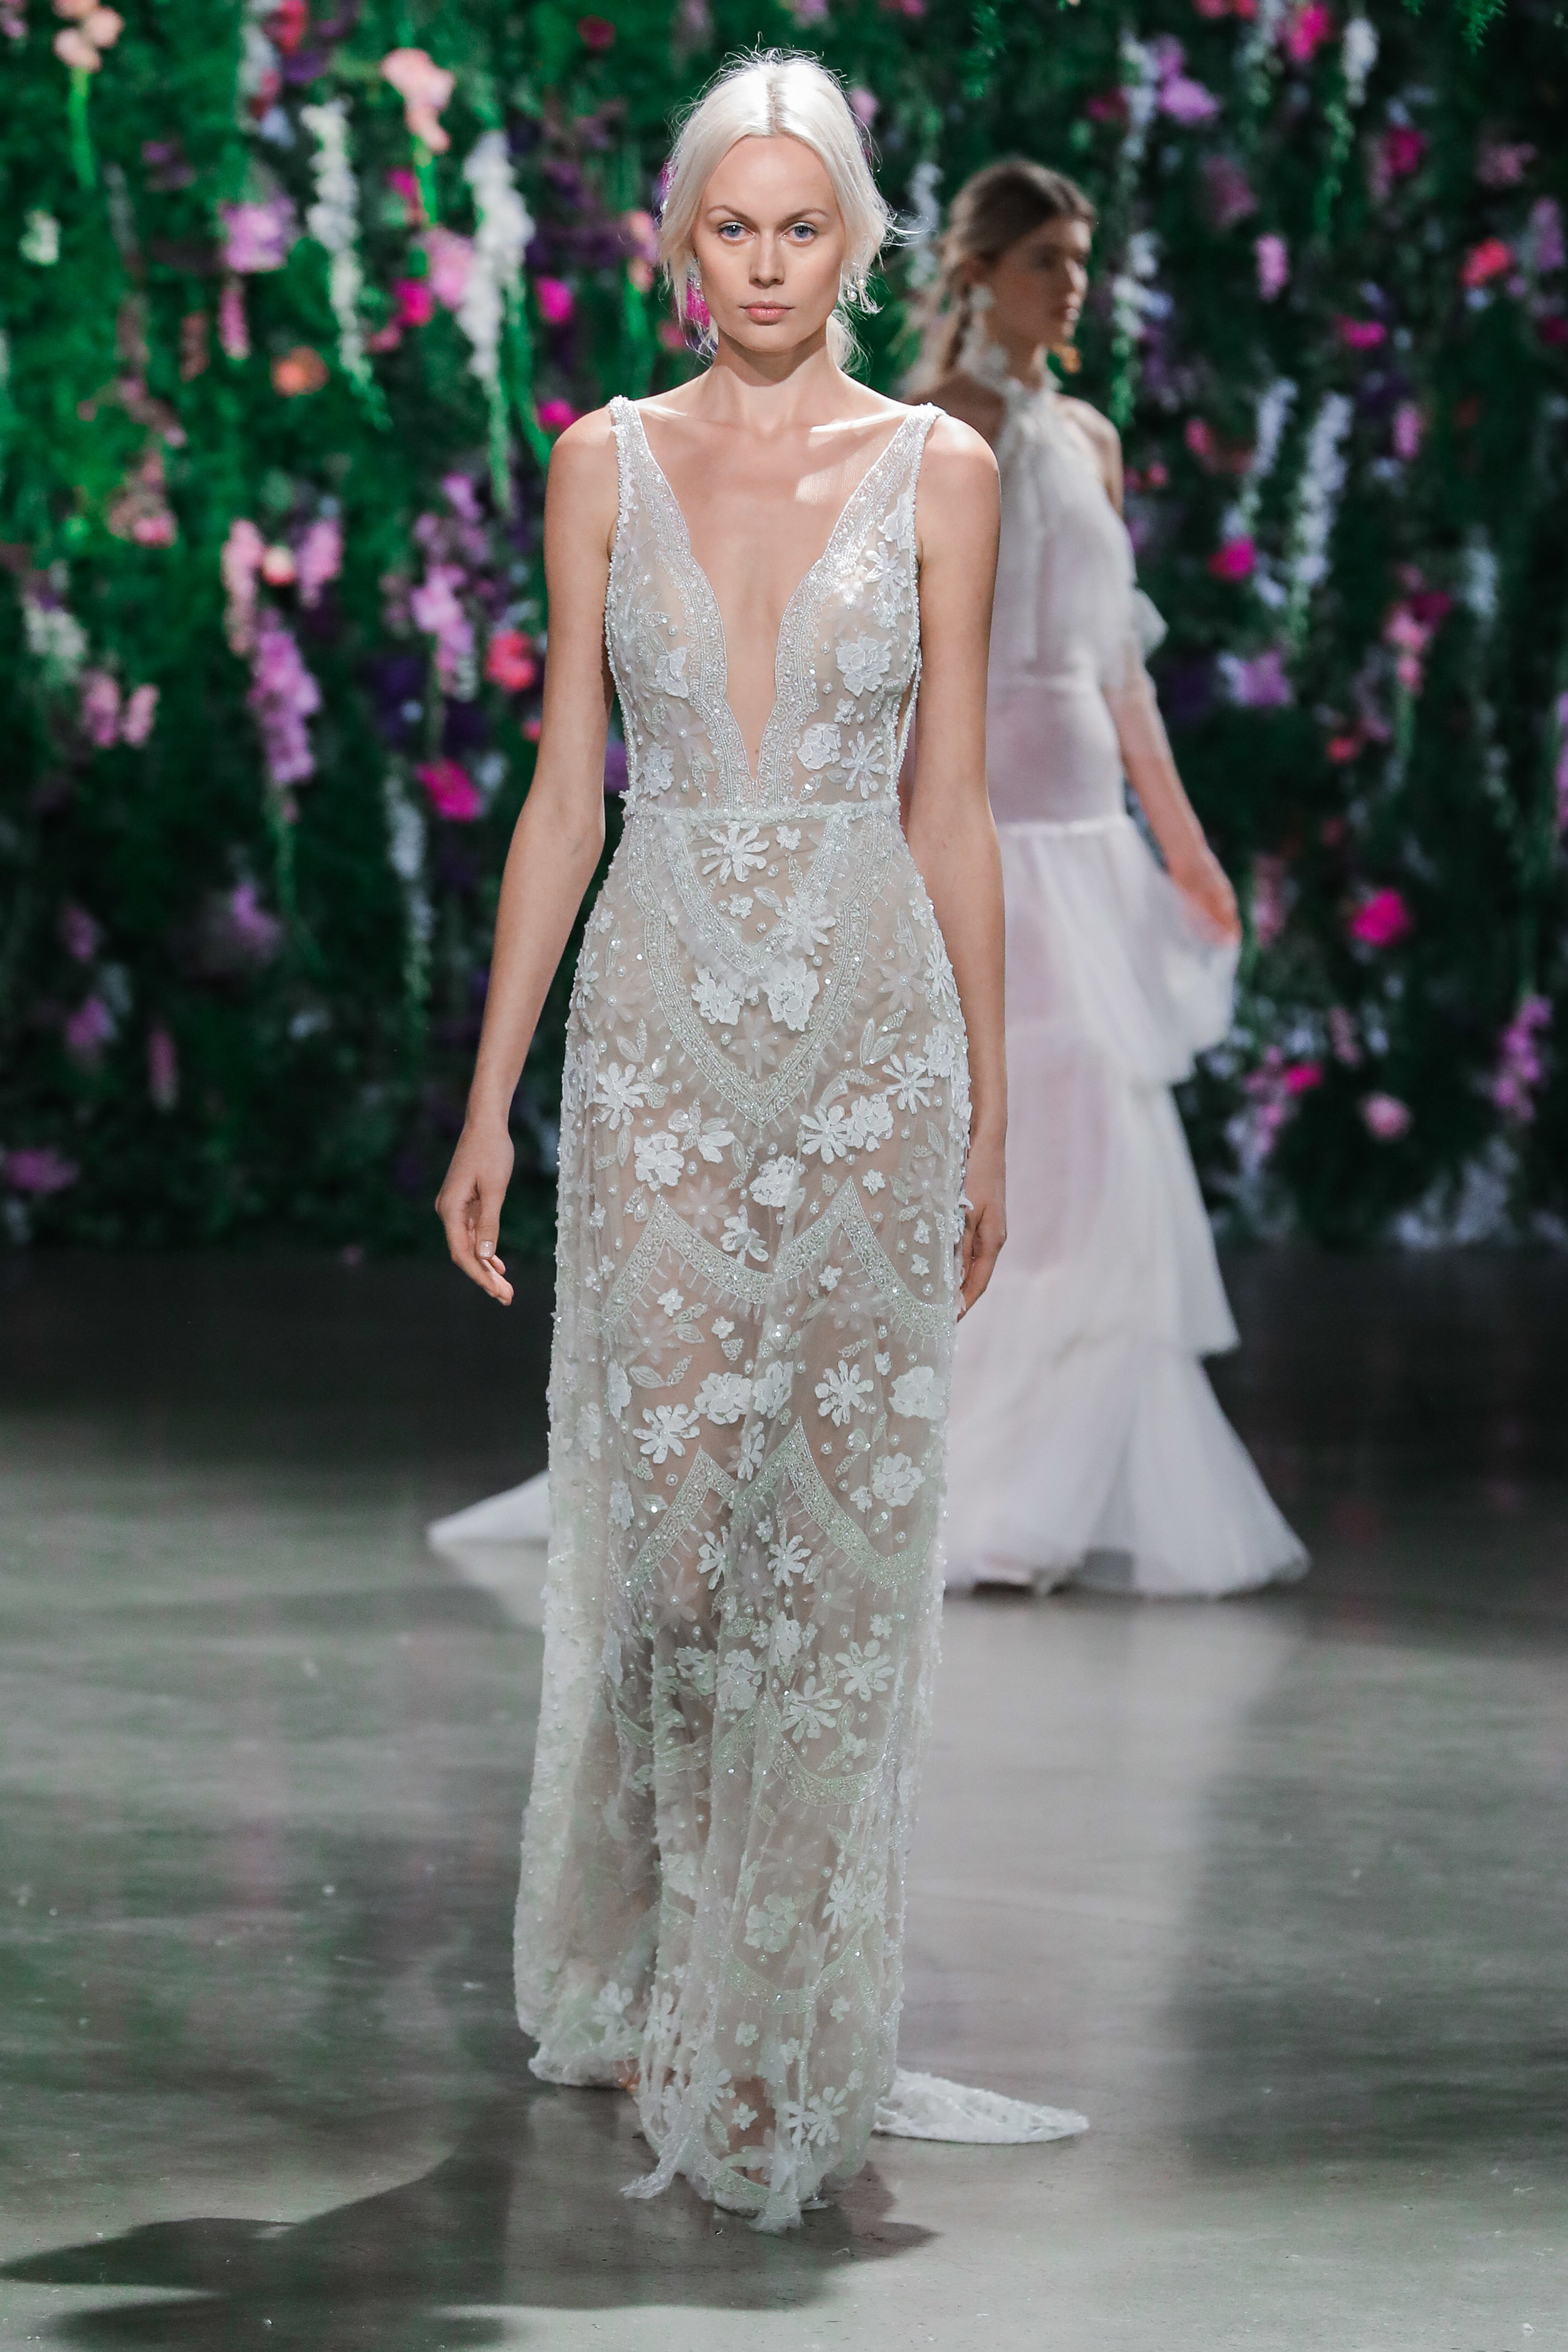 deep-v-neck-wedding-dress-seattle